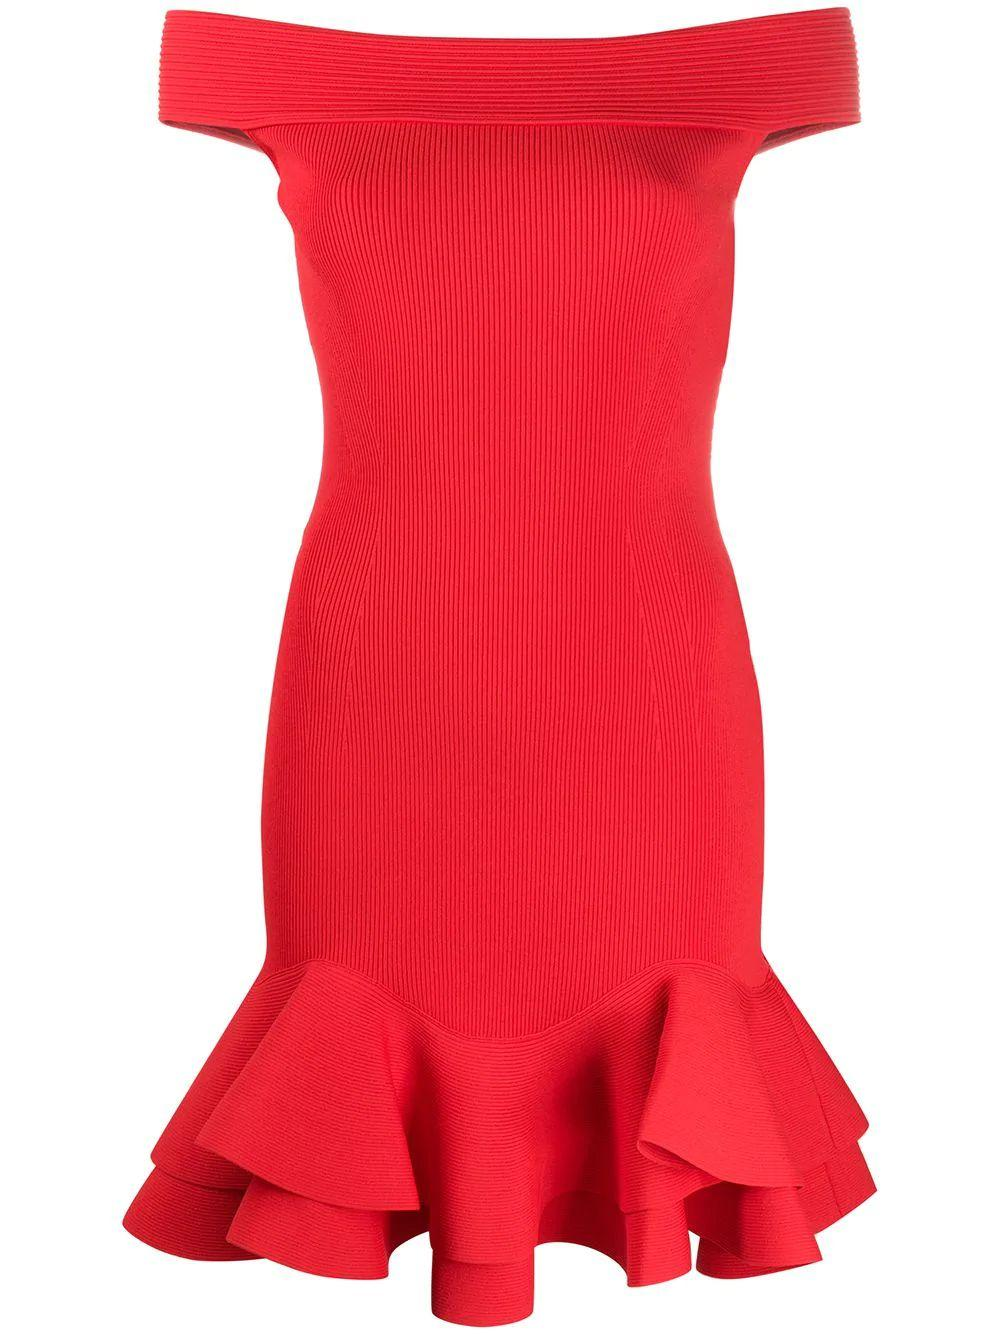 Off Shoulder Knit Mini Dress Item # 633641Q1APM